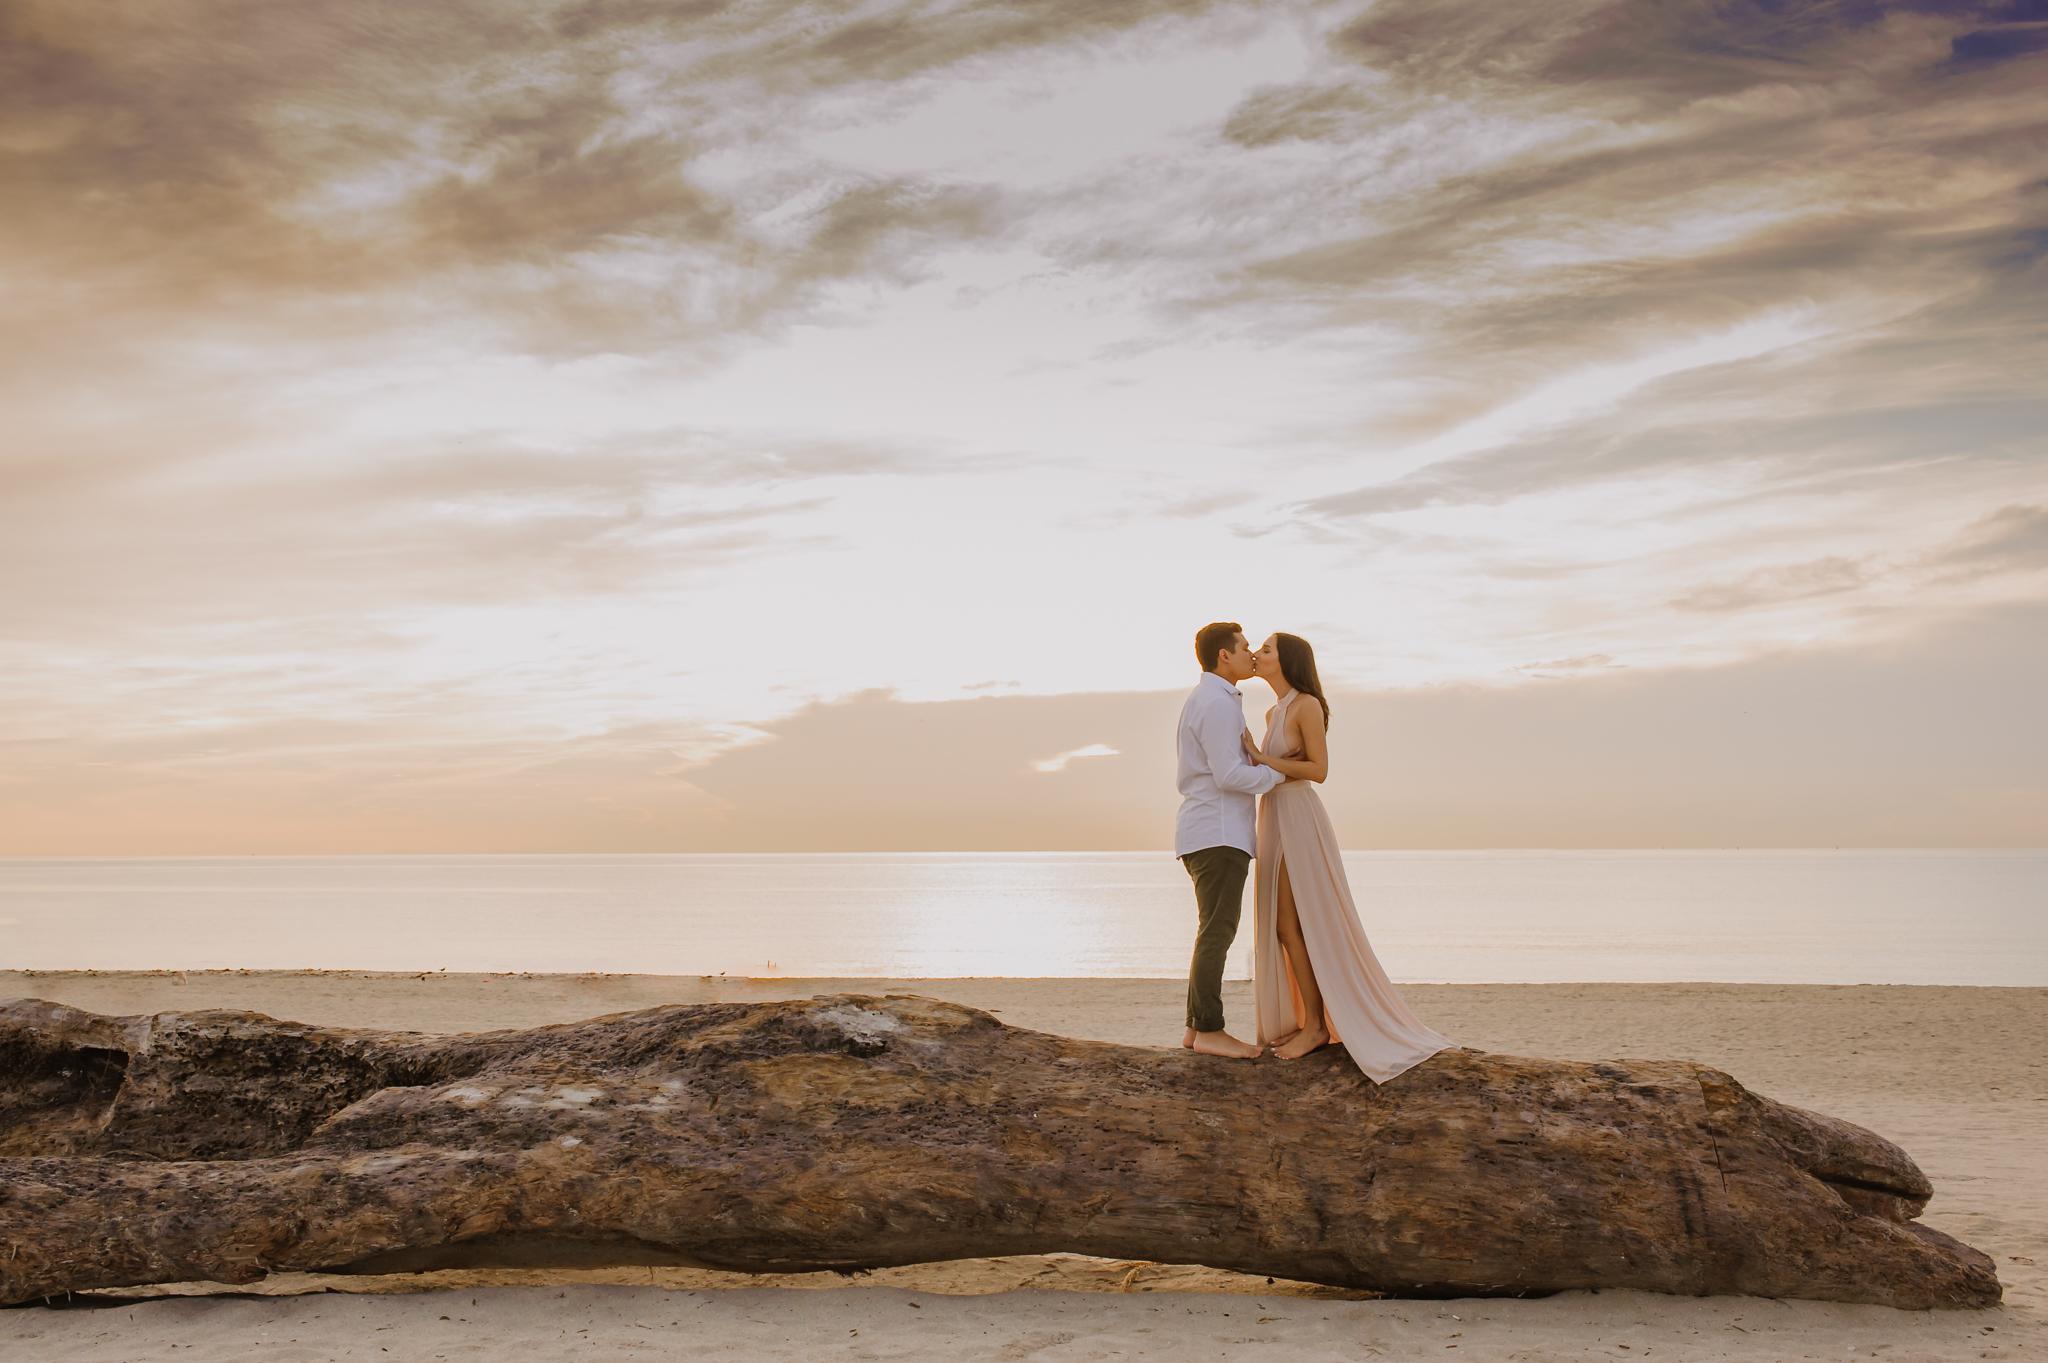 miami-beach-sunrise-engagement-vanessa-and-johnny-photography-video-1-14.jpg